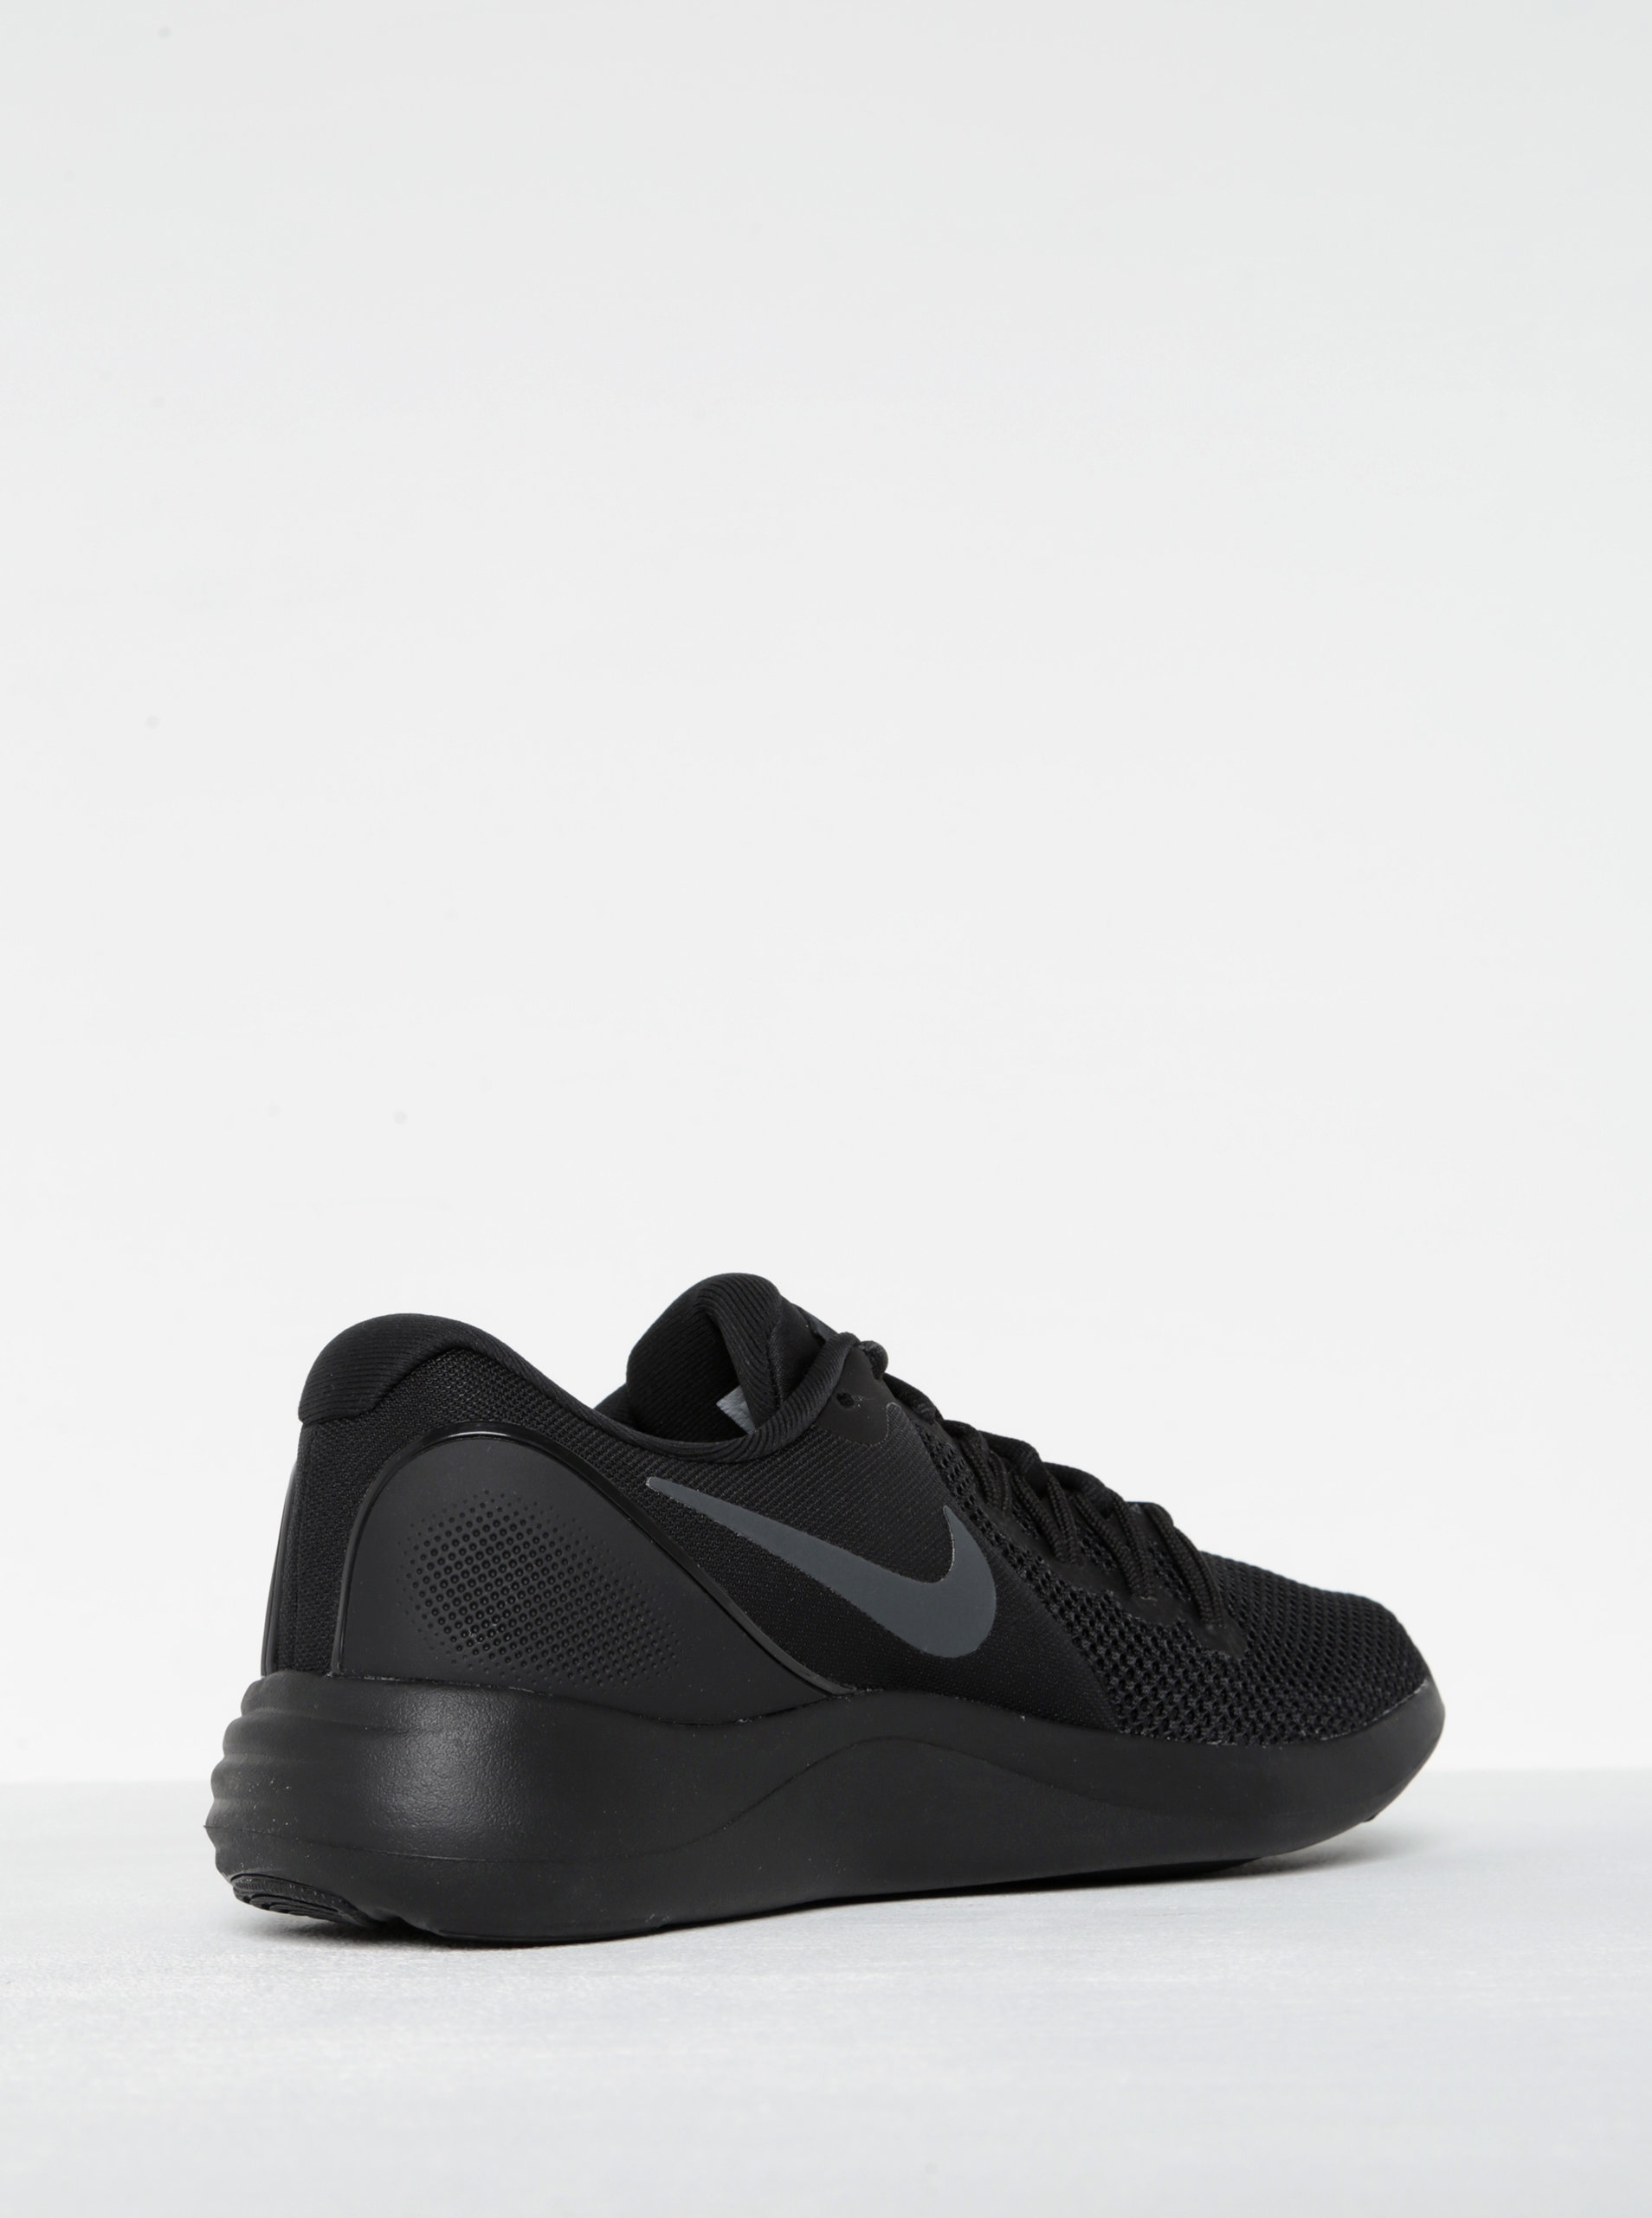 4d4906070e8 Černé pánské tenisky Nike Lunar Apparent ...